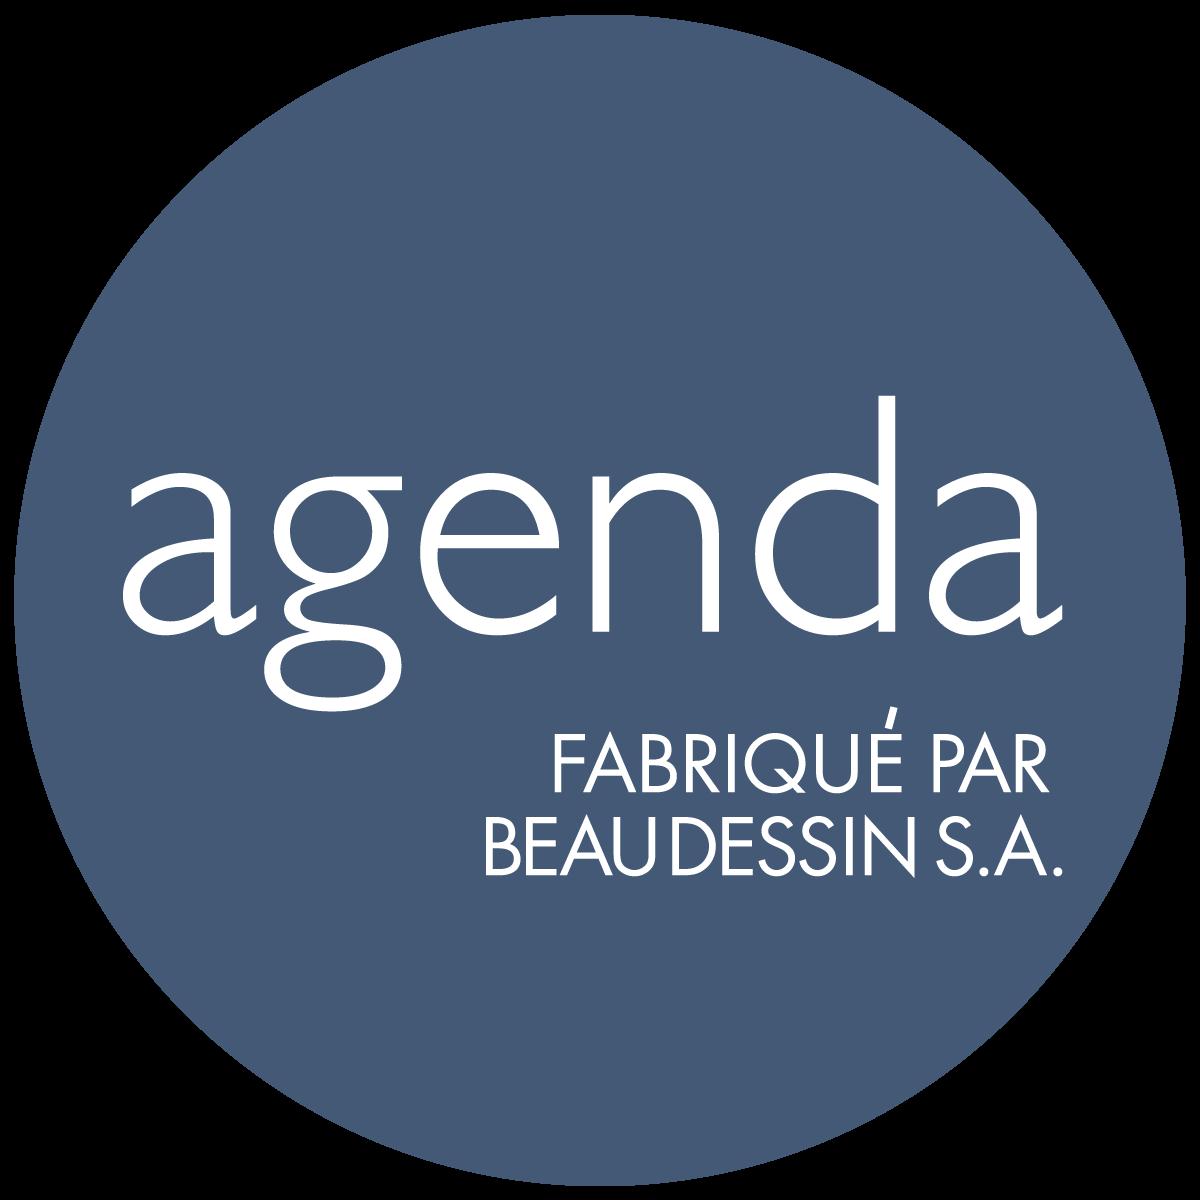 agenda | アジェンダ ボーデッサン/デリーヴ・ド・ボーデッサン直営店 | 台東区谷中